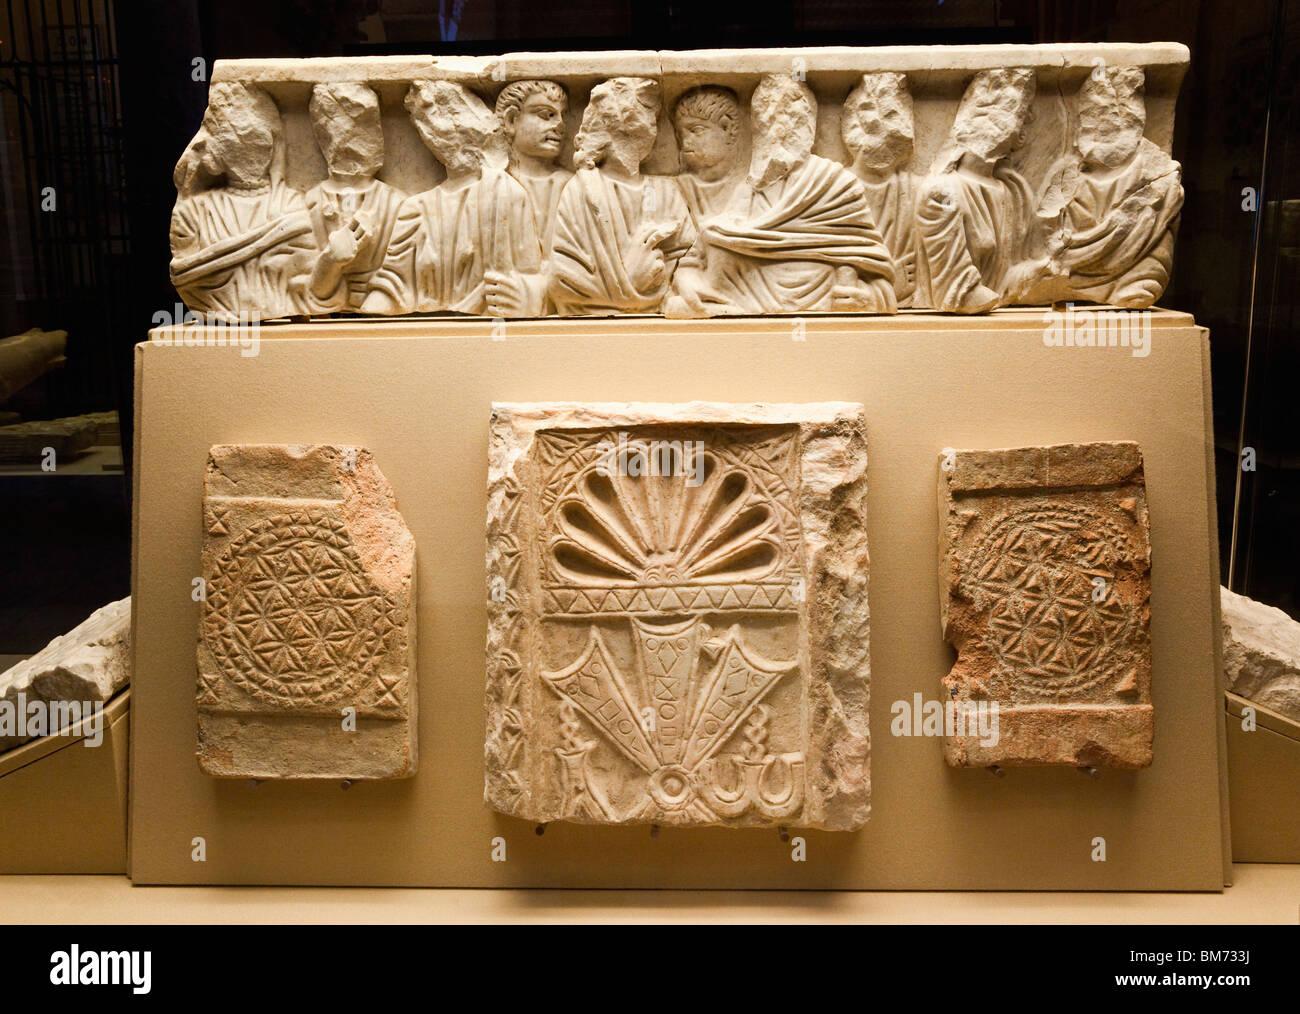 Fragments of Visigothic stonework, Cordoba, Spain.  SEE DESCRIPTION FOR DETAILS. - Stock Image